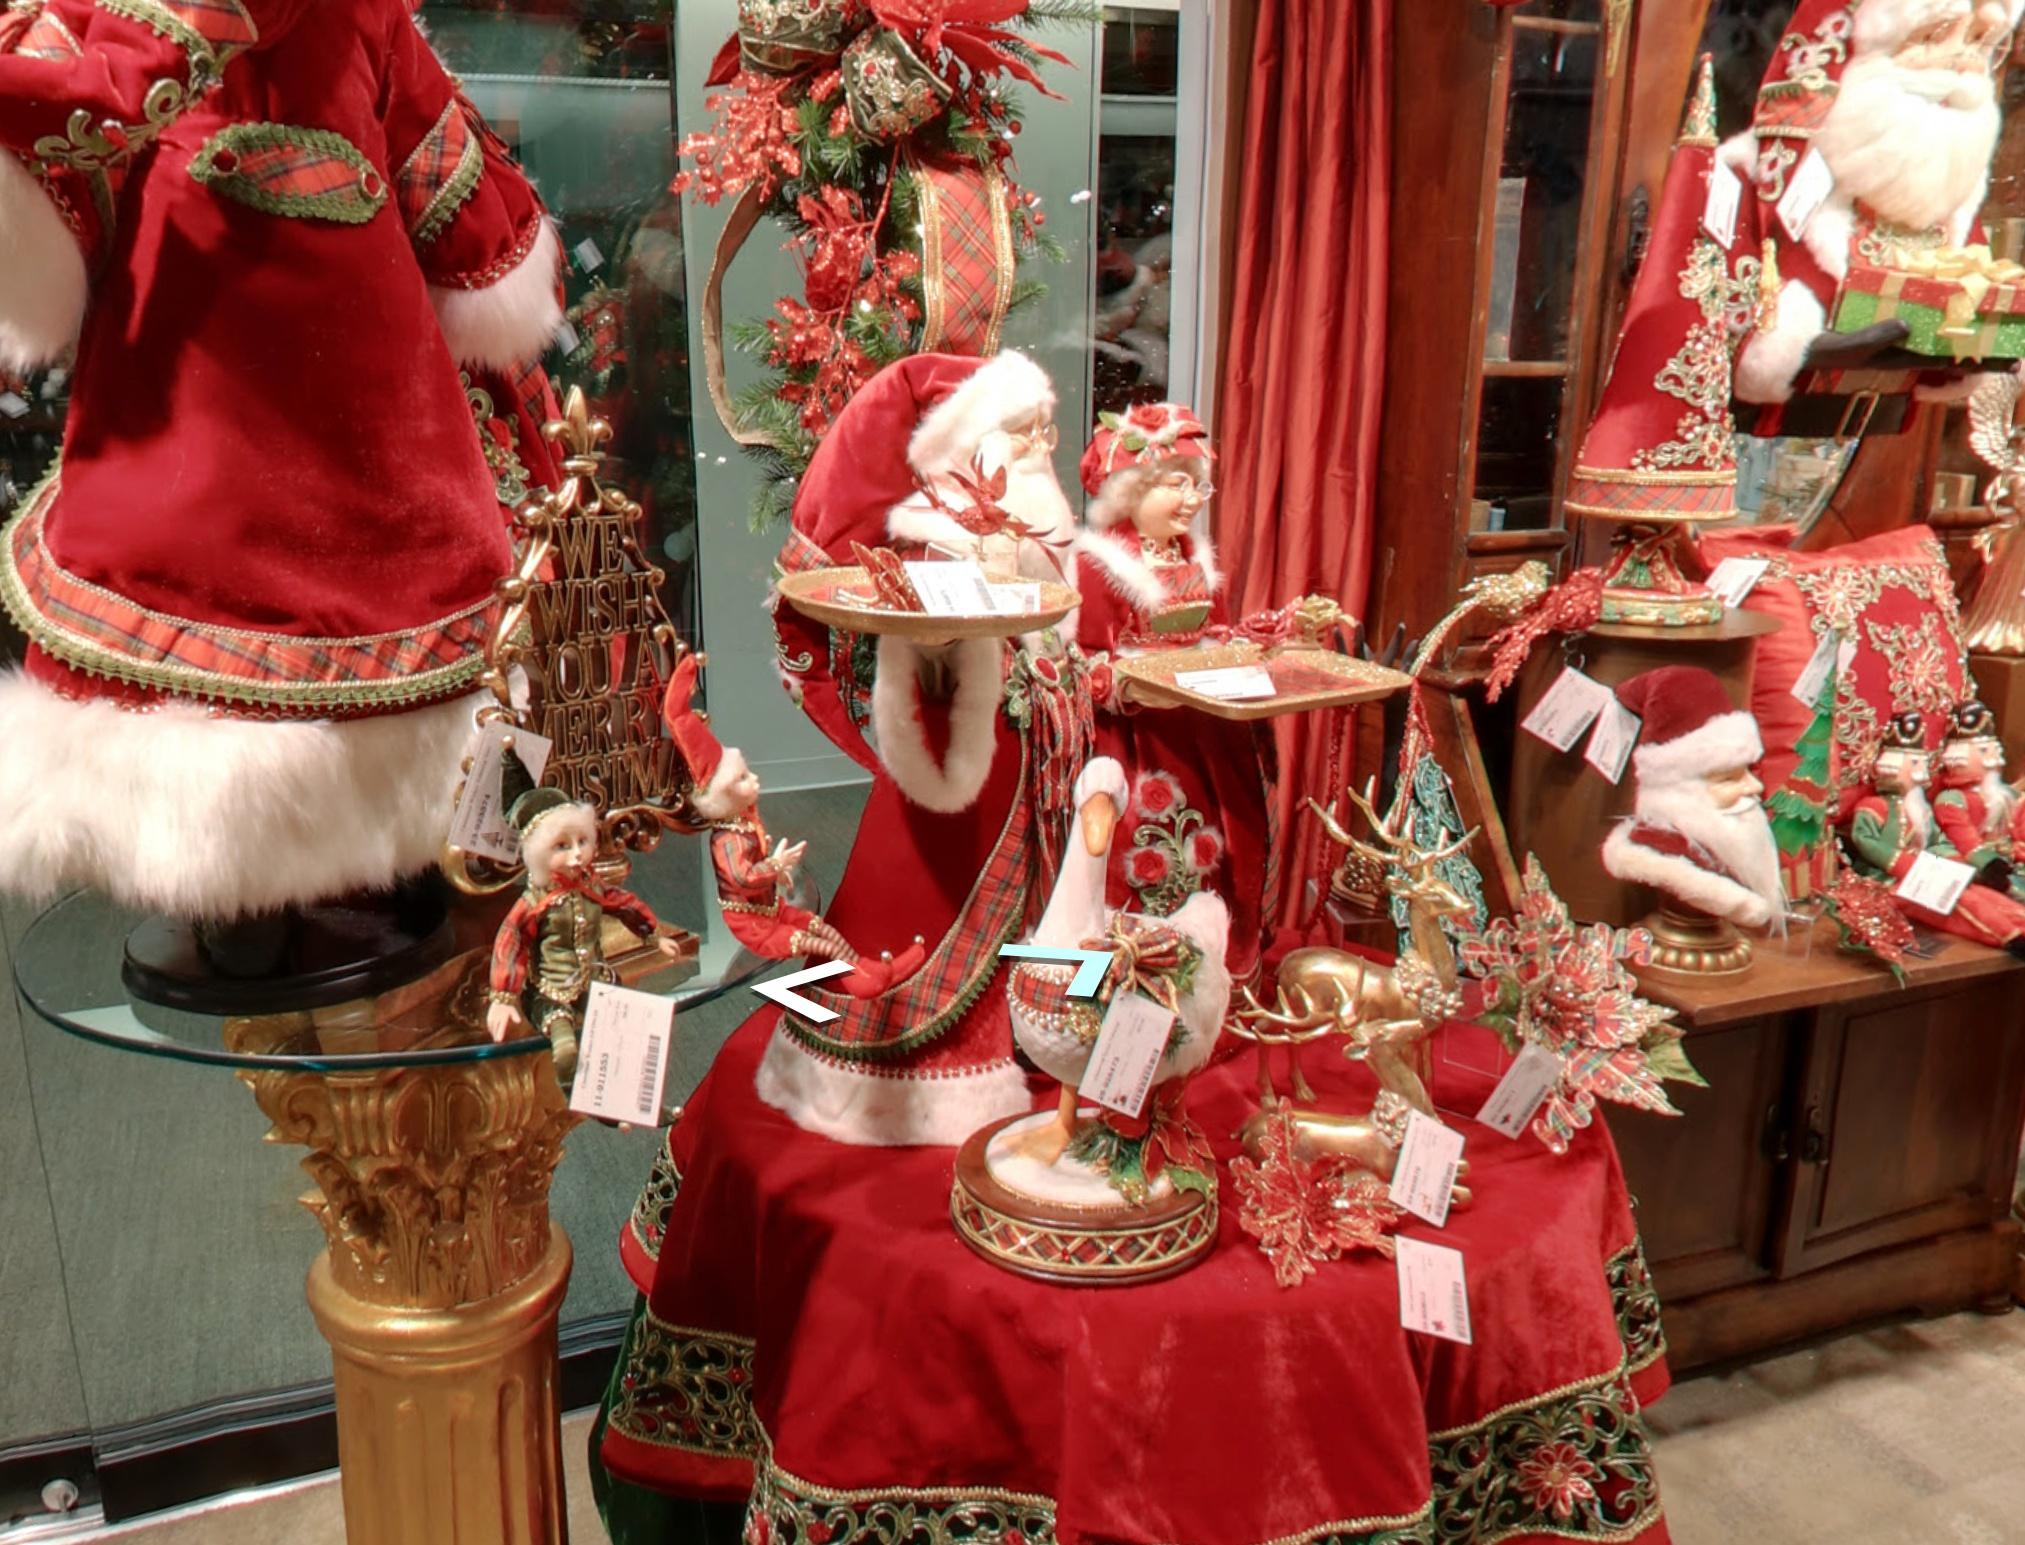 UOHomeDecor's 2012 Christmas Decorating contest | UO Home ... |Christmas Decorations Online